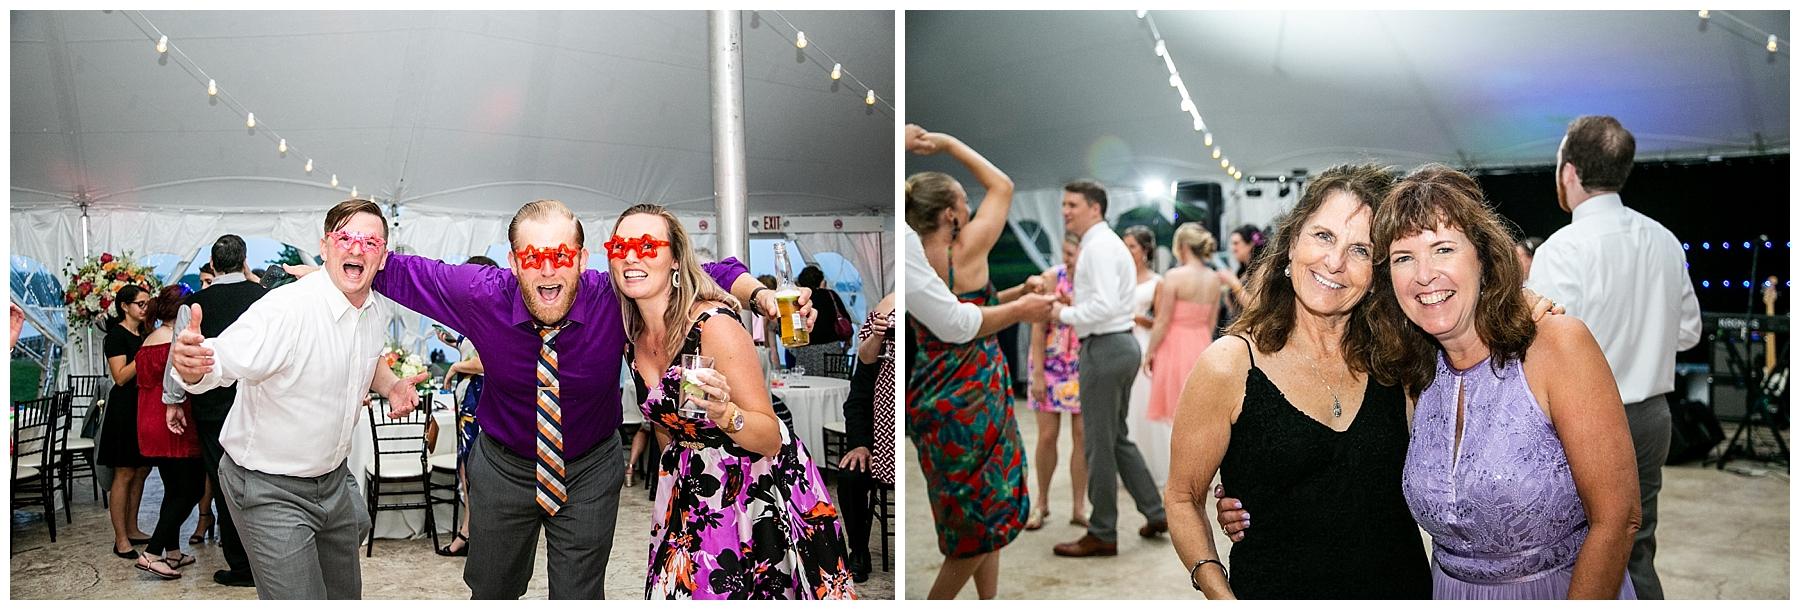 Chelsea Phil Bohemia River Overlook Wedding Living Radiant Photography photos_0201.jpg